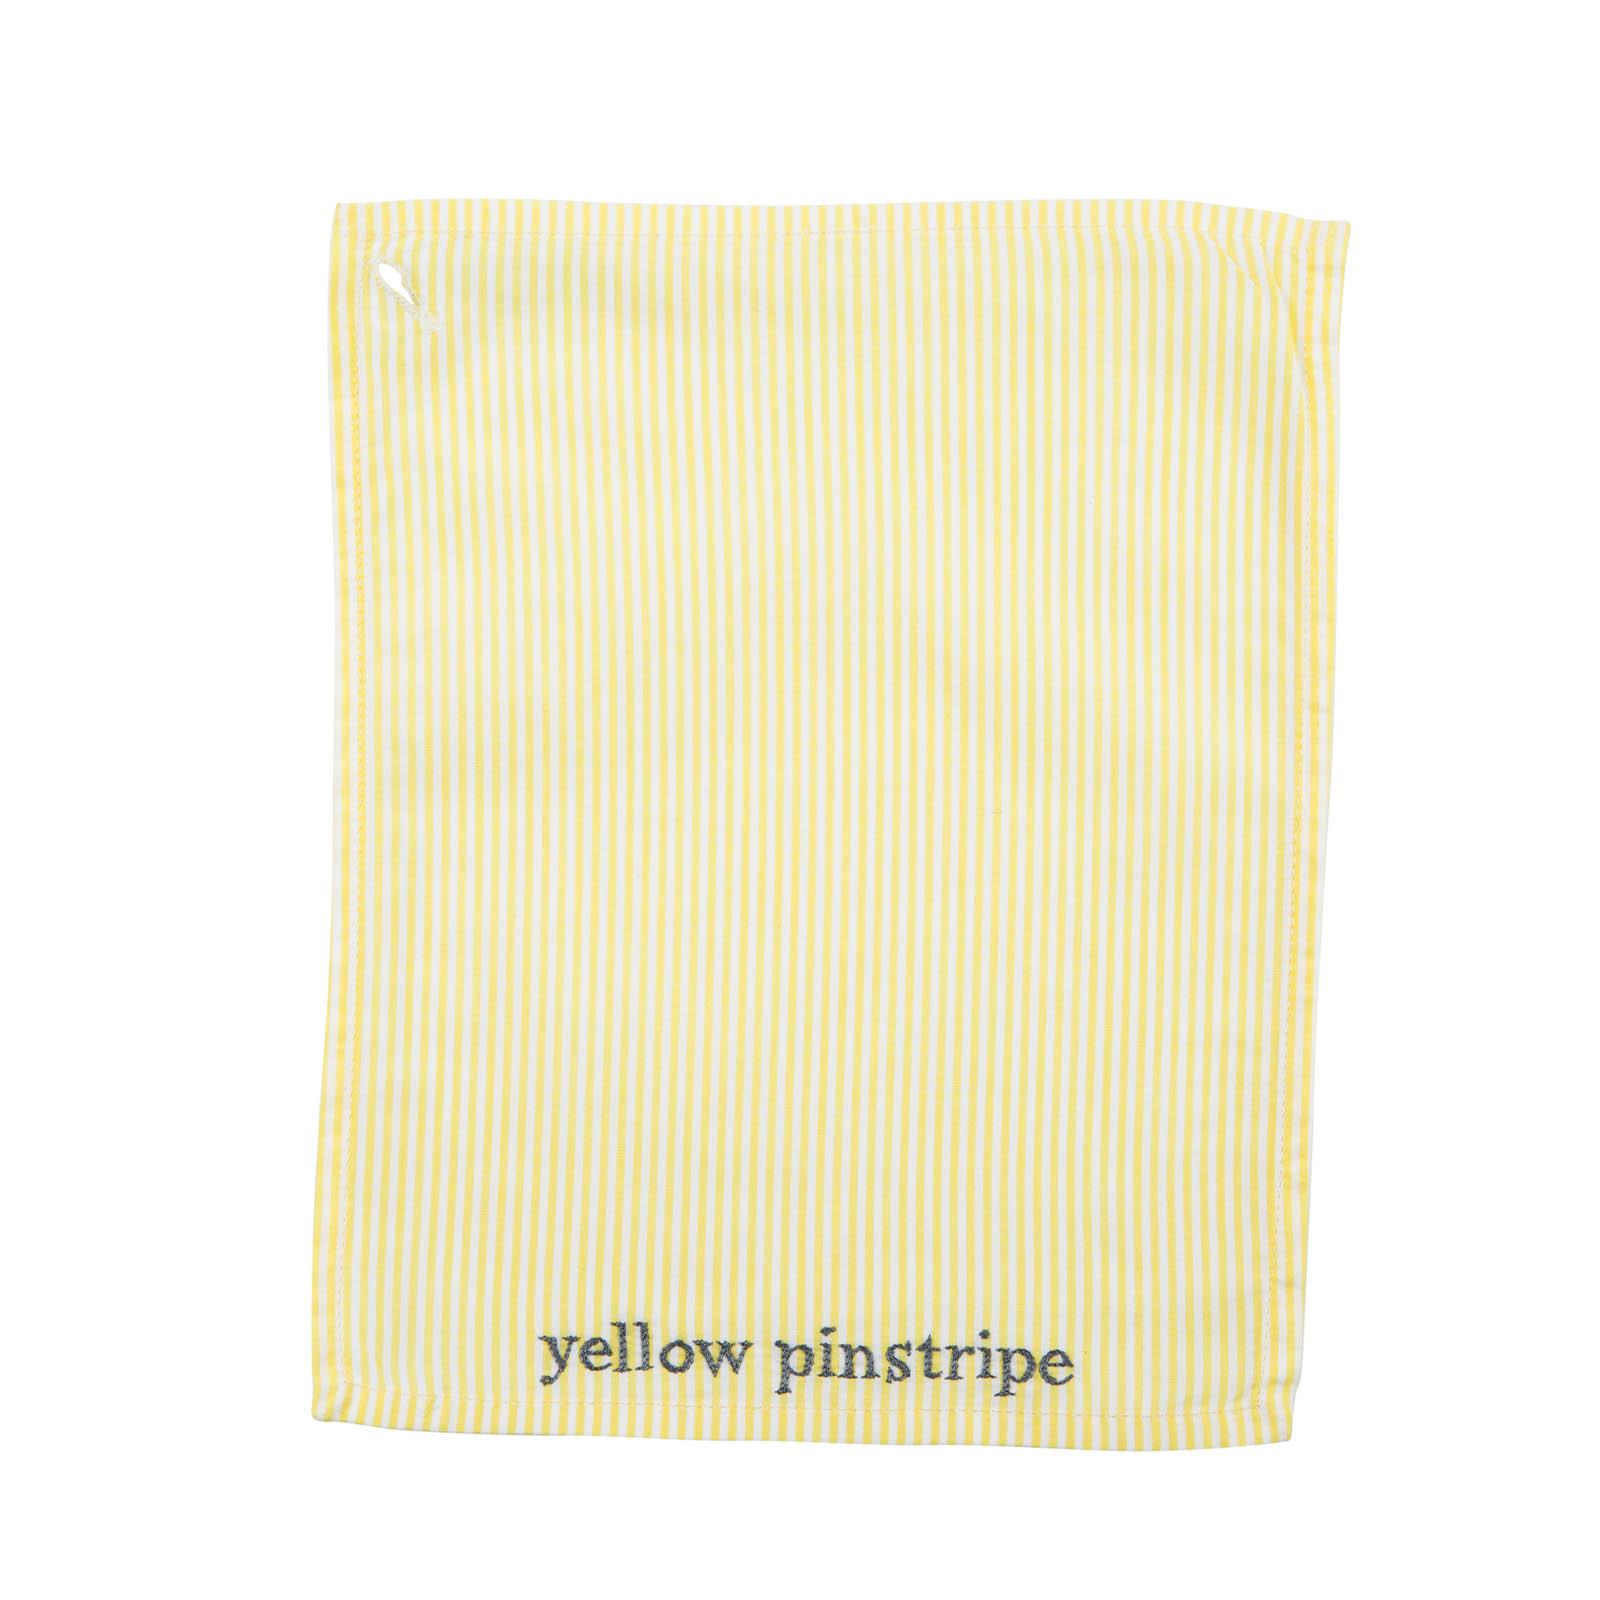 YELLOW PINSTRIPE